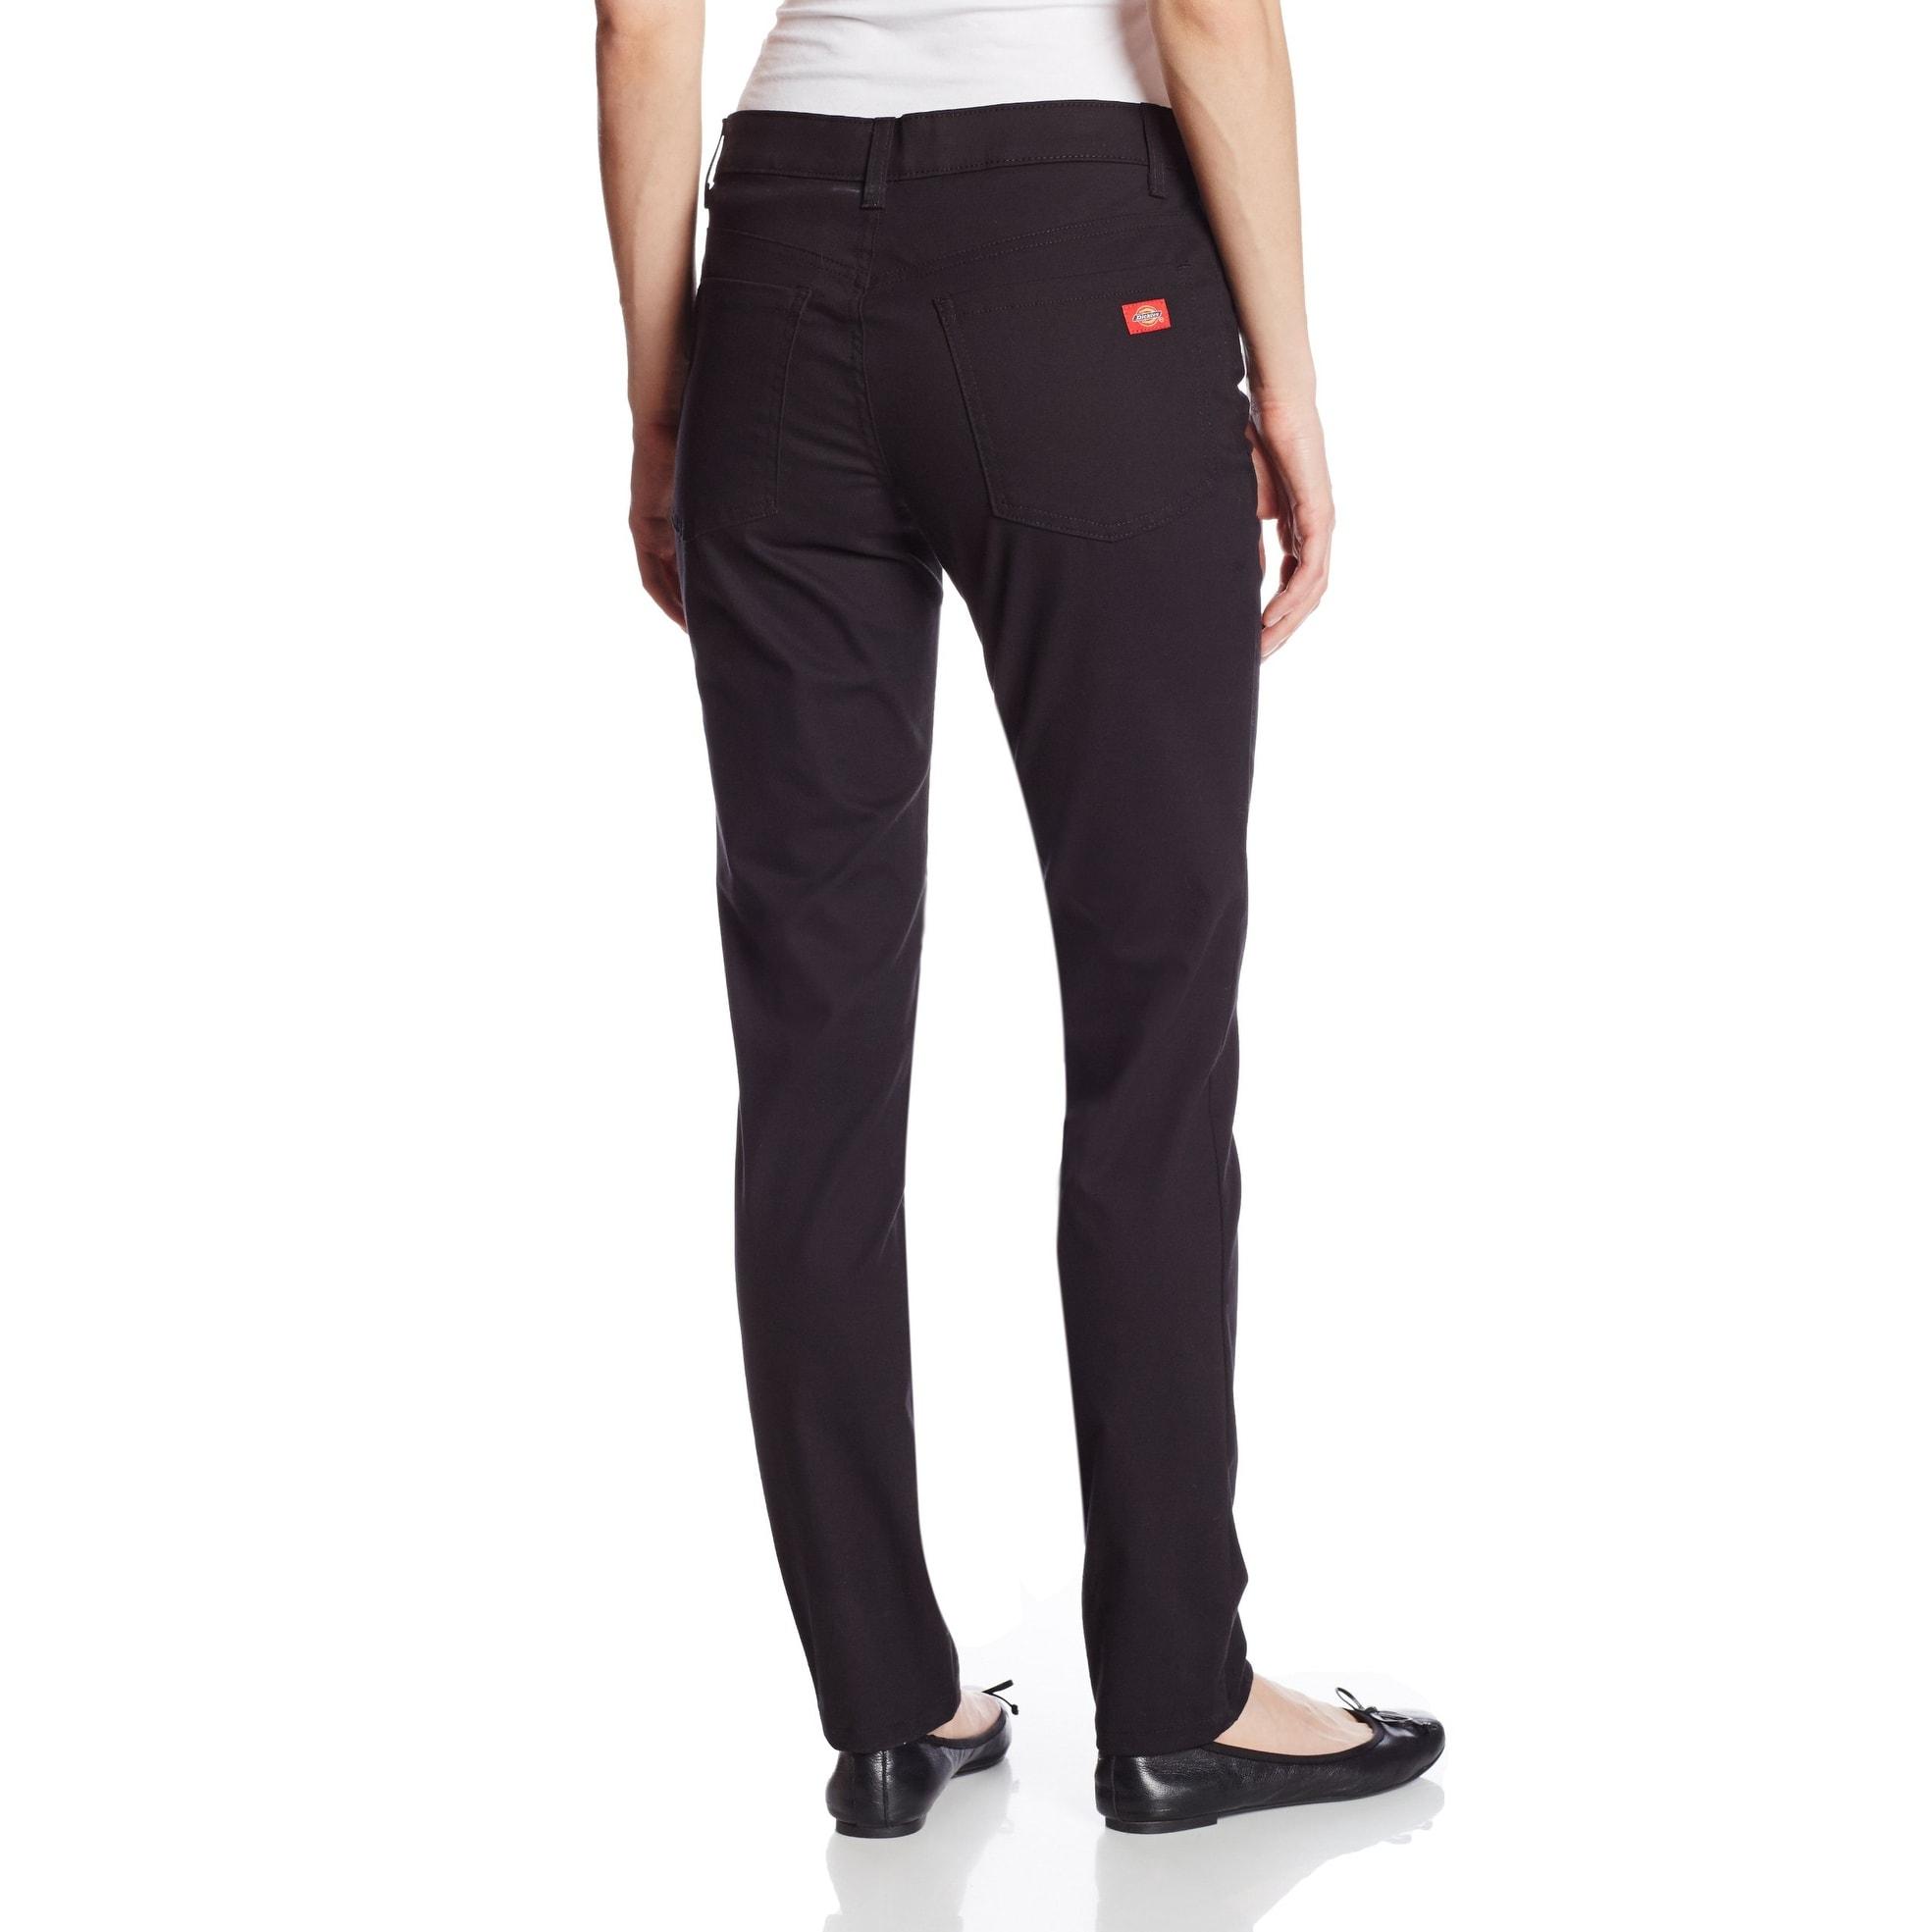 cb10665202e Shop Dickies Black Women s Size 4X30 Slim Fit Skinny Stretch Twill ...